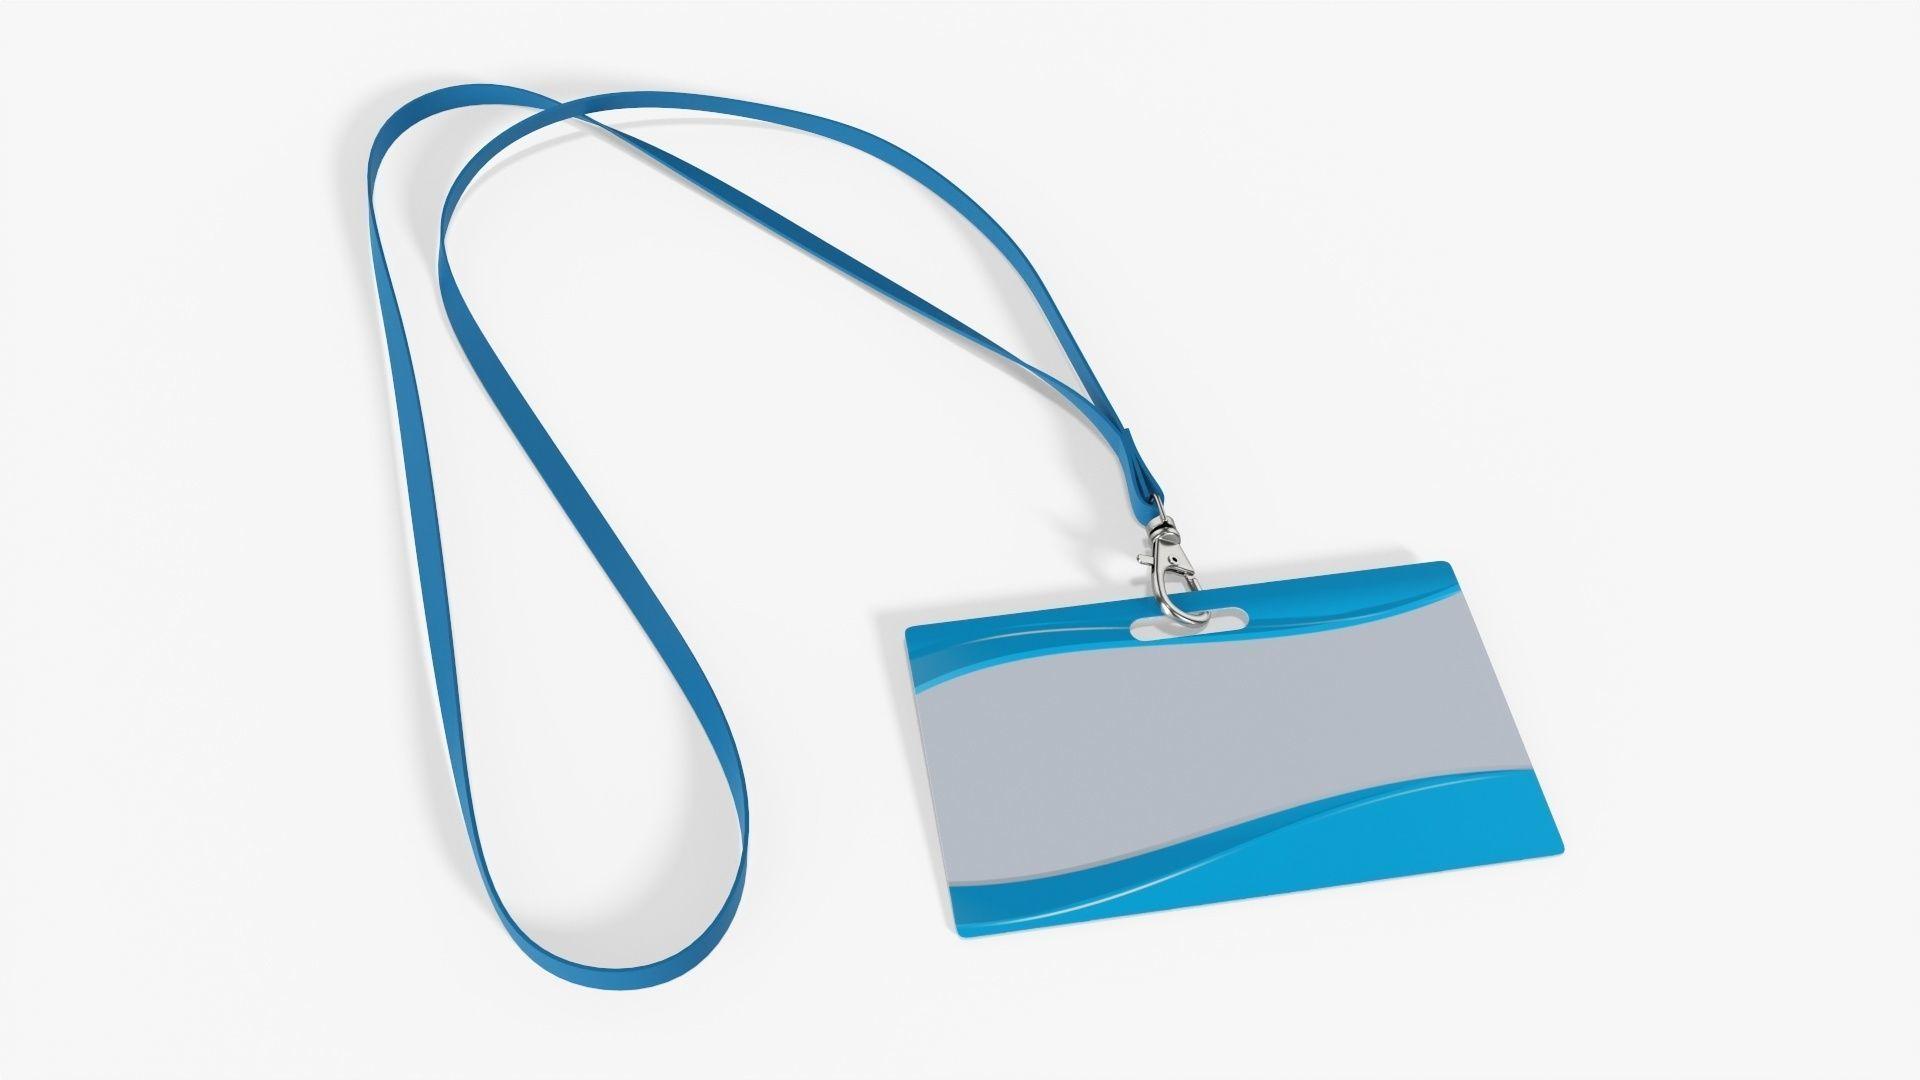 Narrow identity card on strap